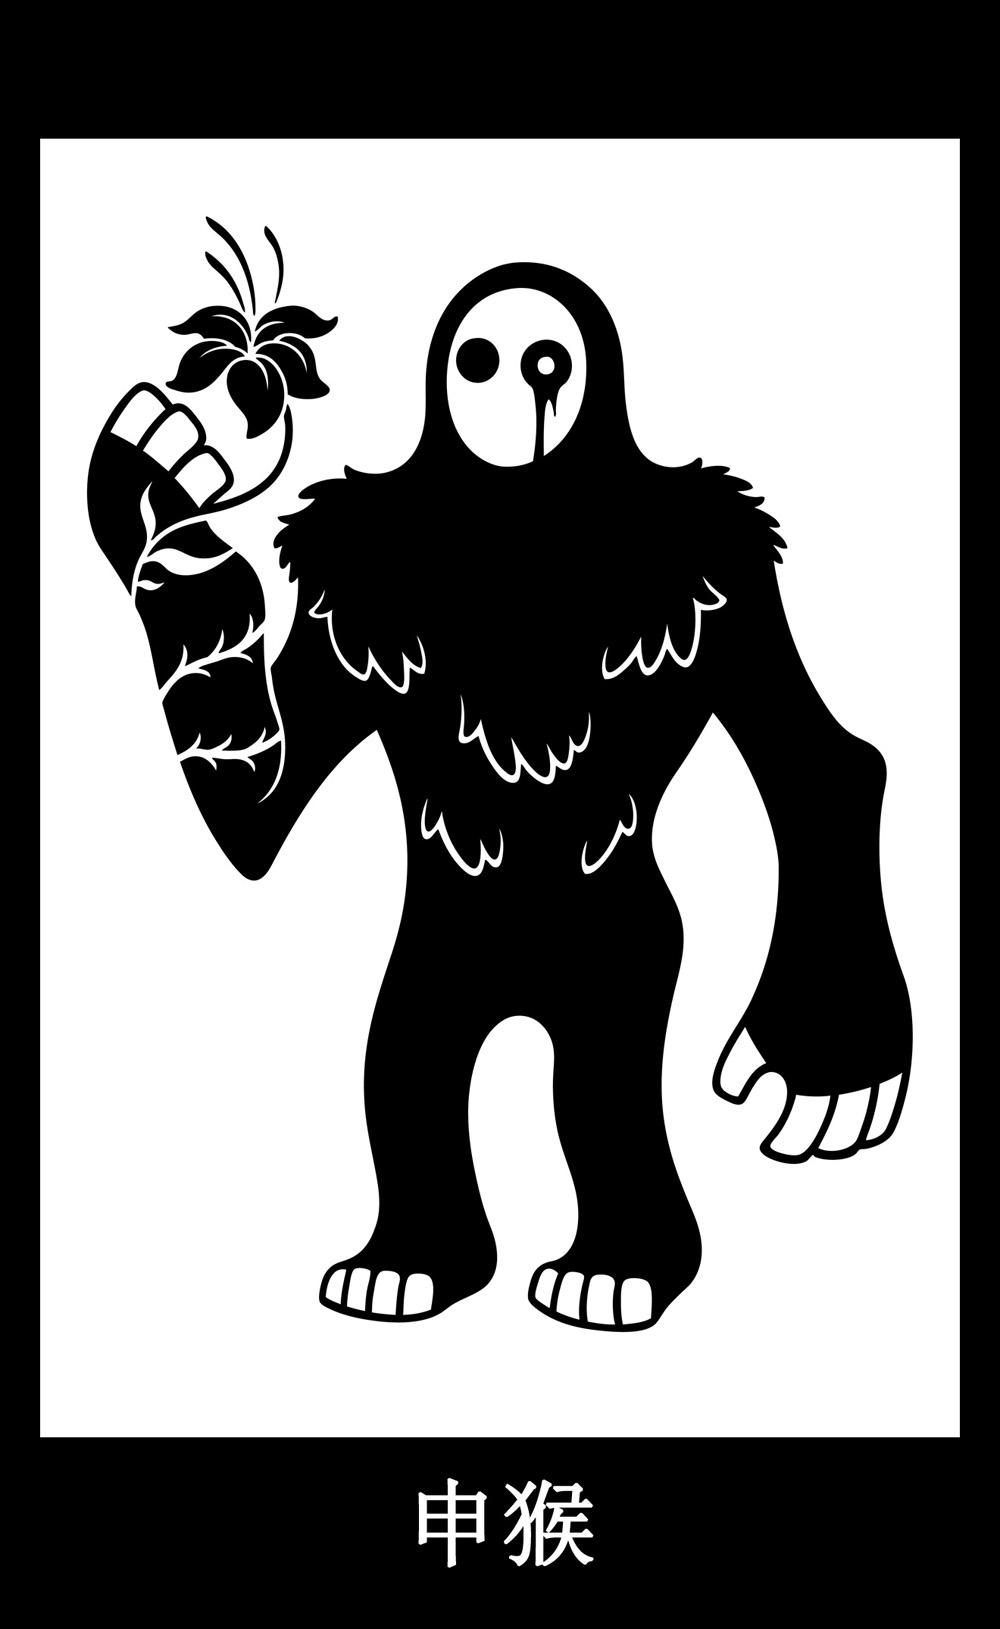 09 - 猴 - SCP-1000 - 大脚怪